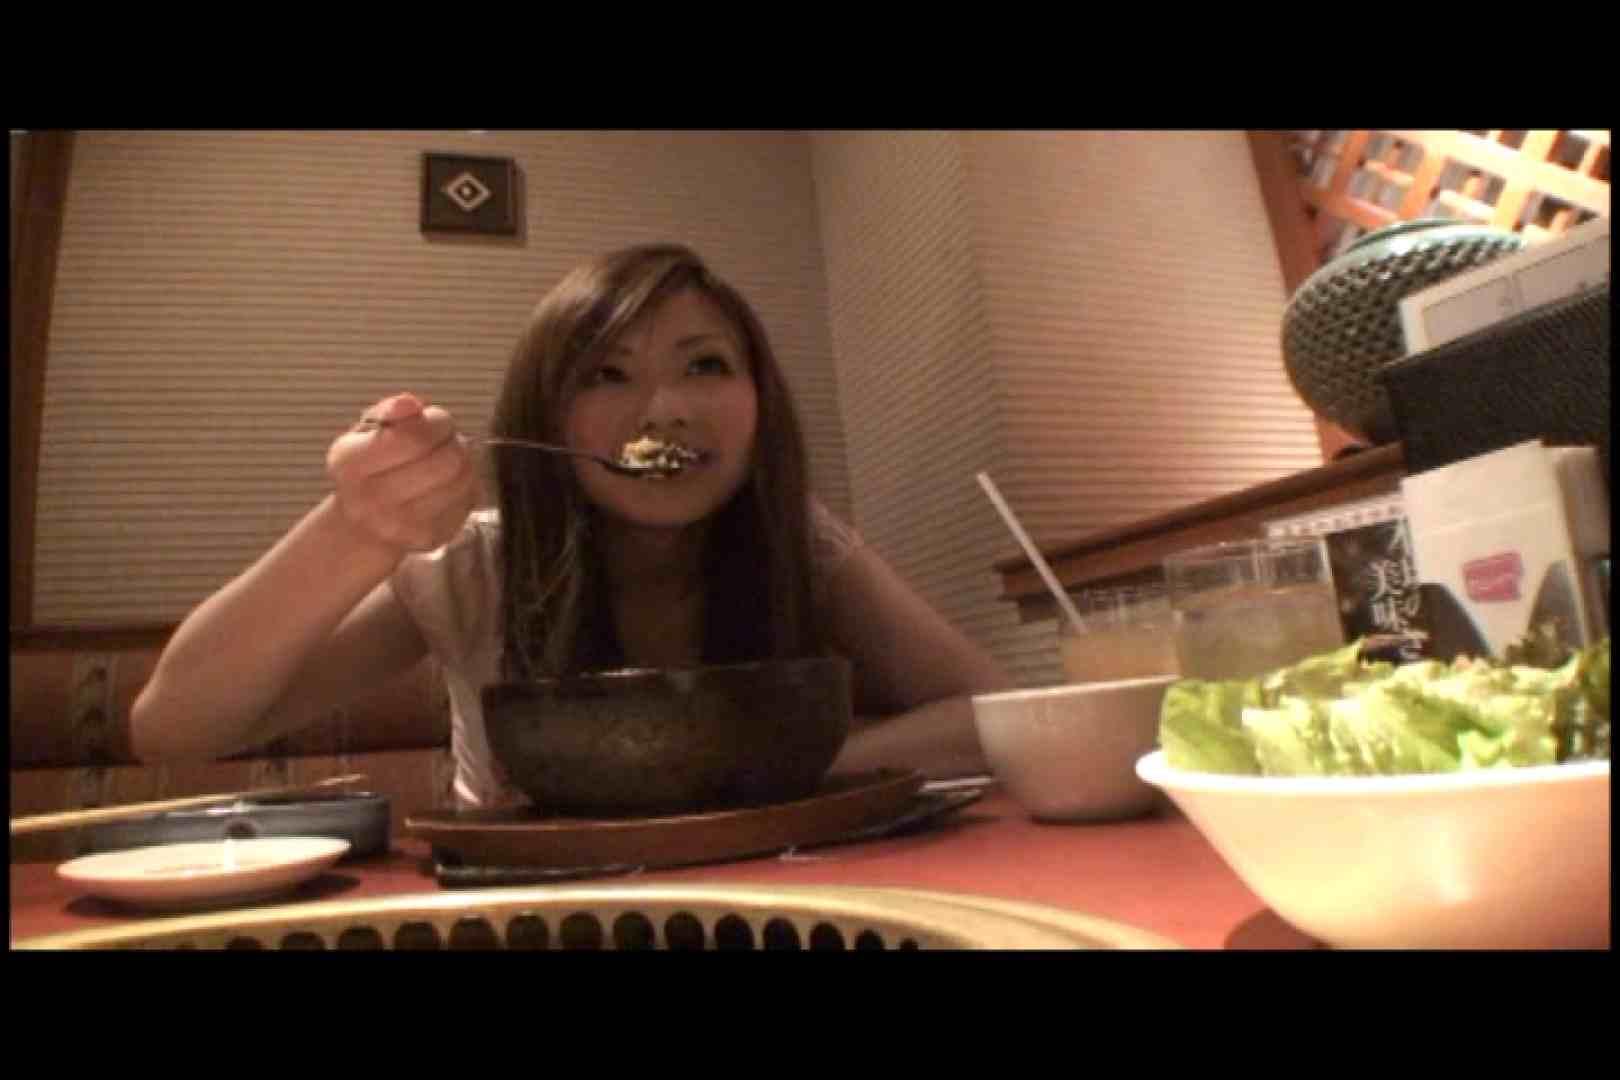 JDハンター全国ツアー vol.052 前編 女子大生のエロ動画 | 0  110PIX 31